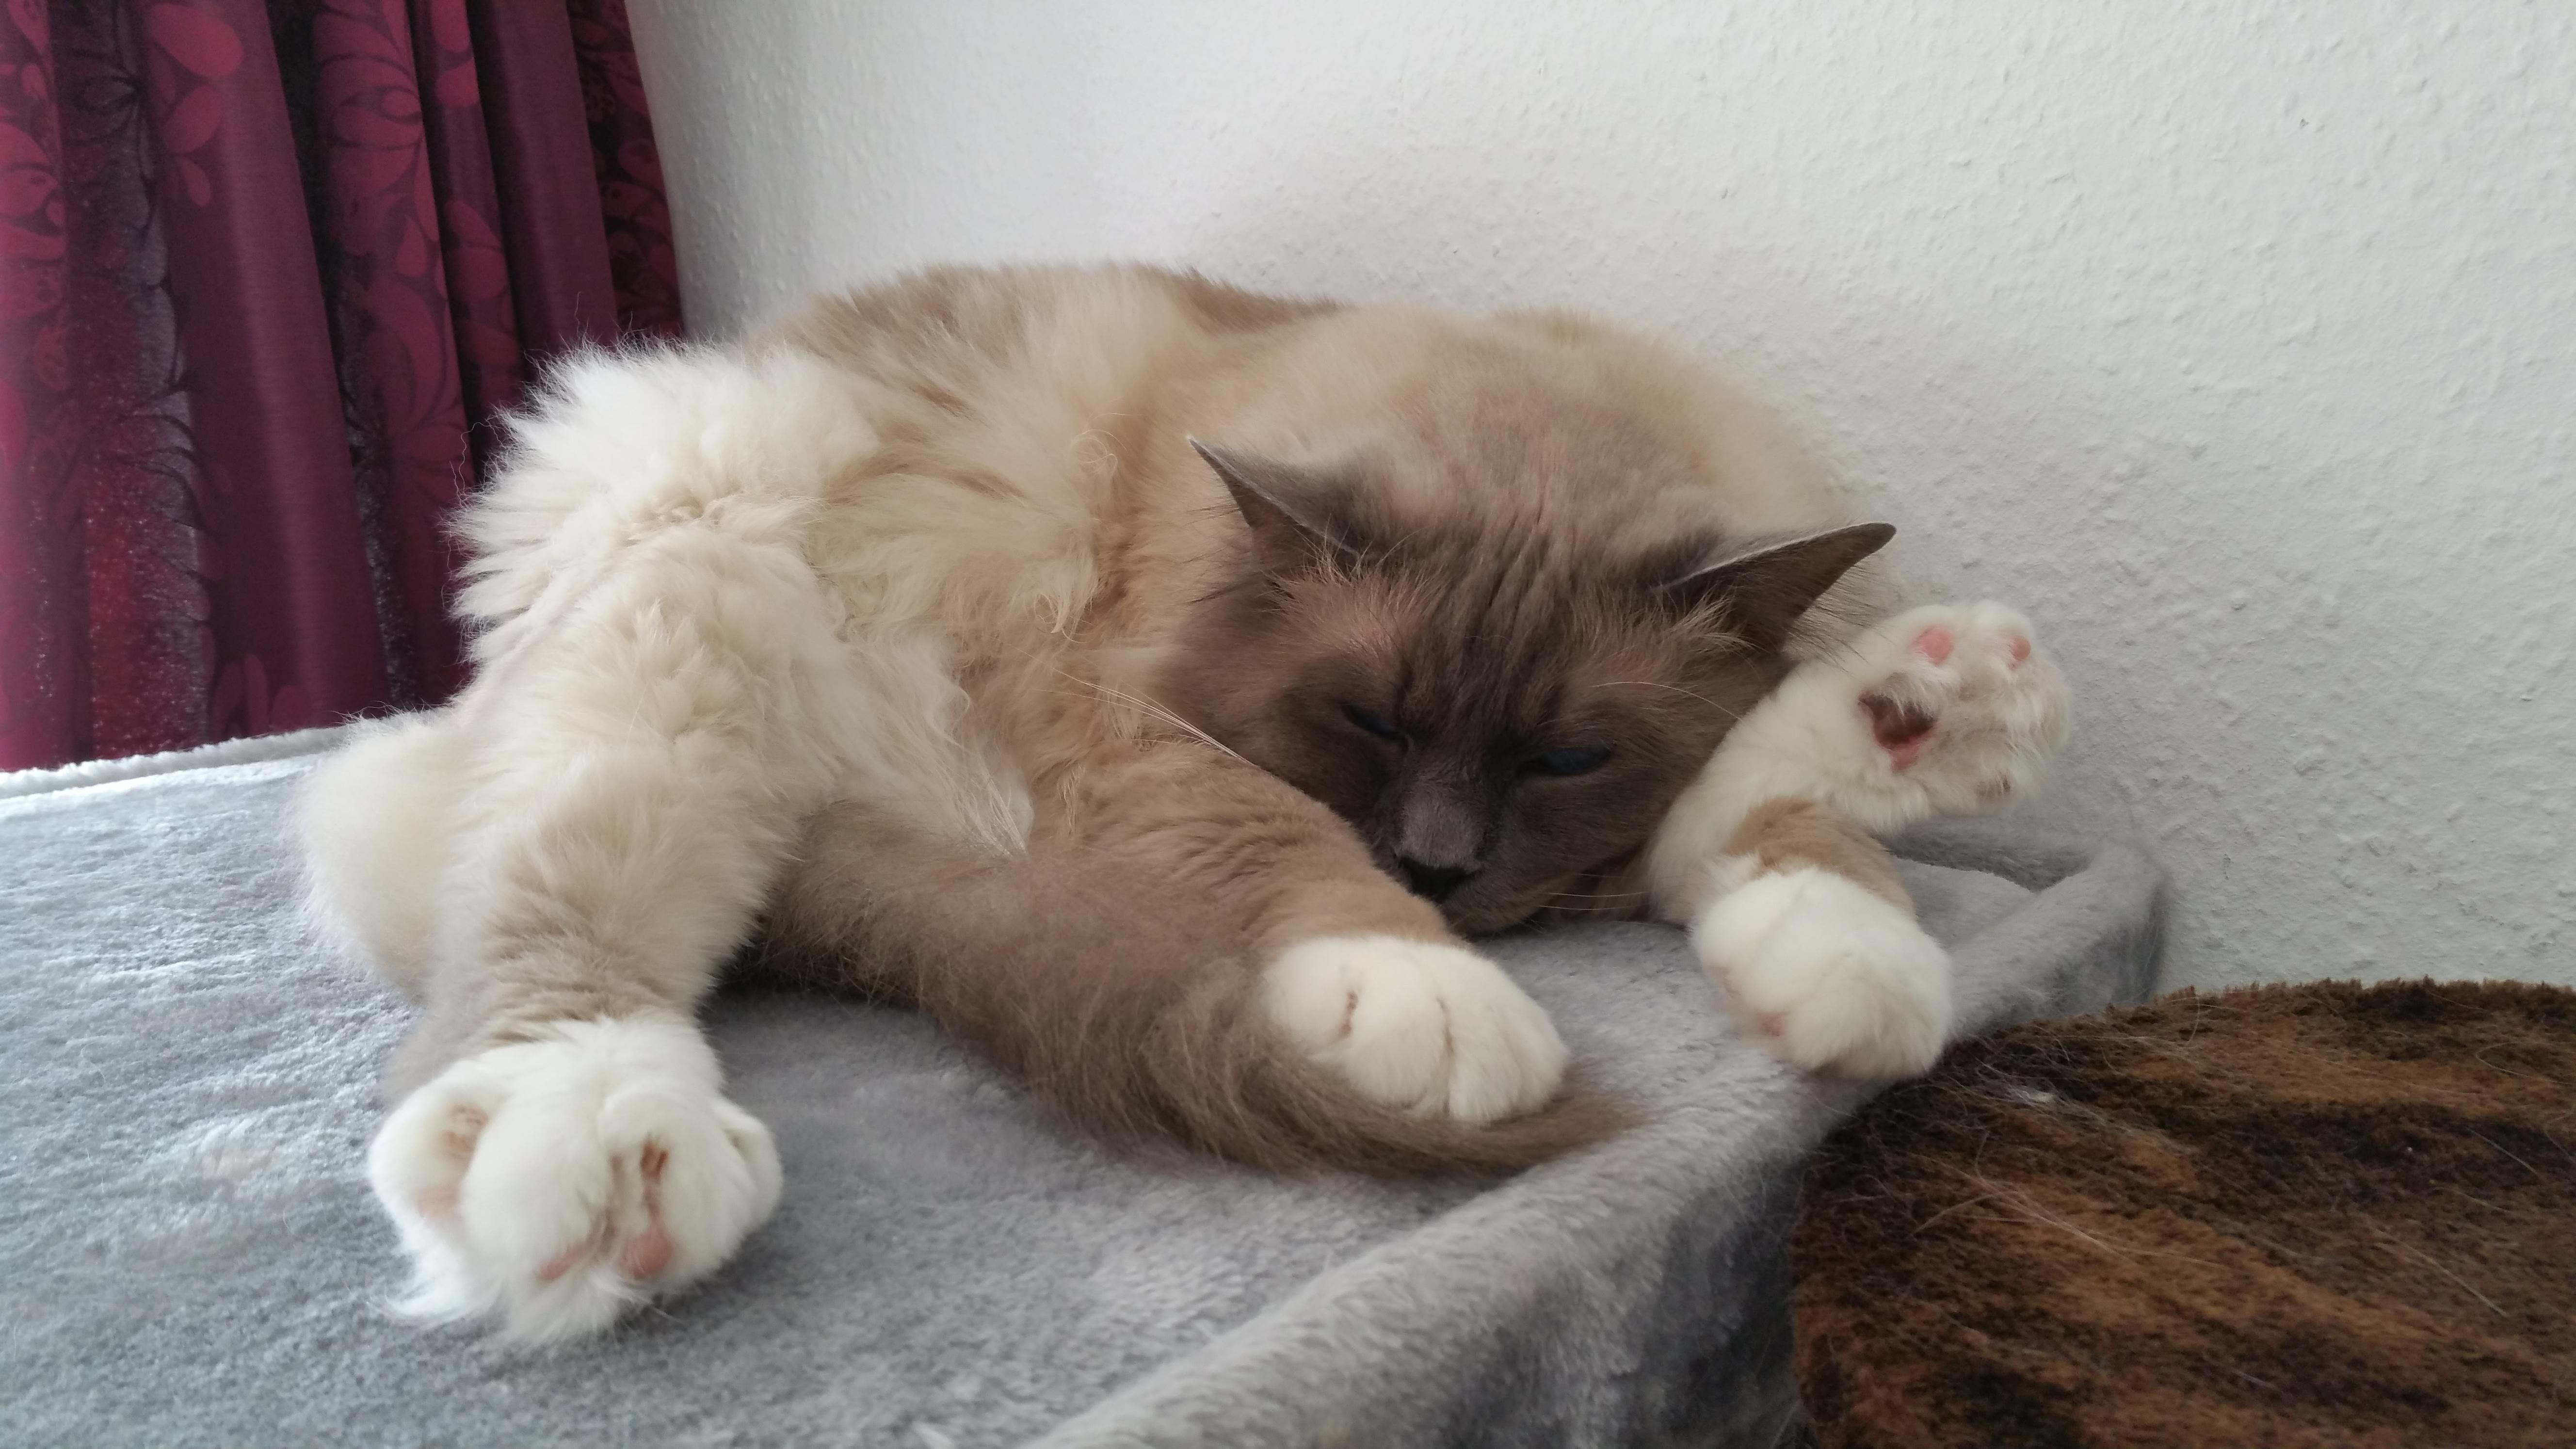 Yoga Kotic Sleeping Pose 9 Years Old Birma Malr Cat Cats In 2020 Sleeping Pose Kitten Cats